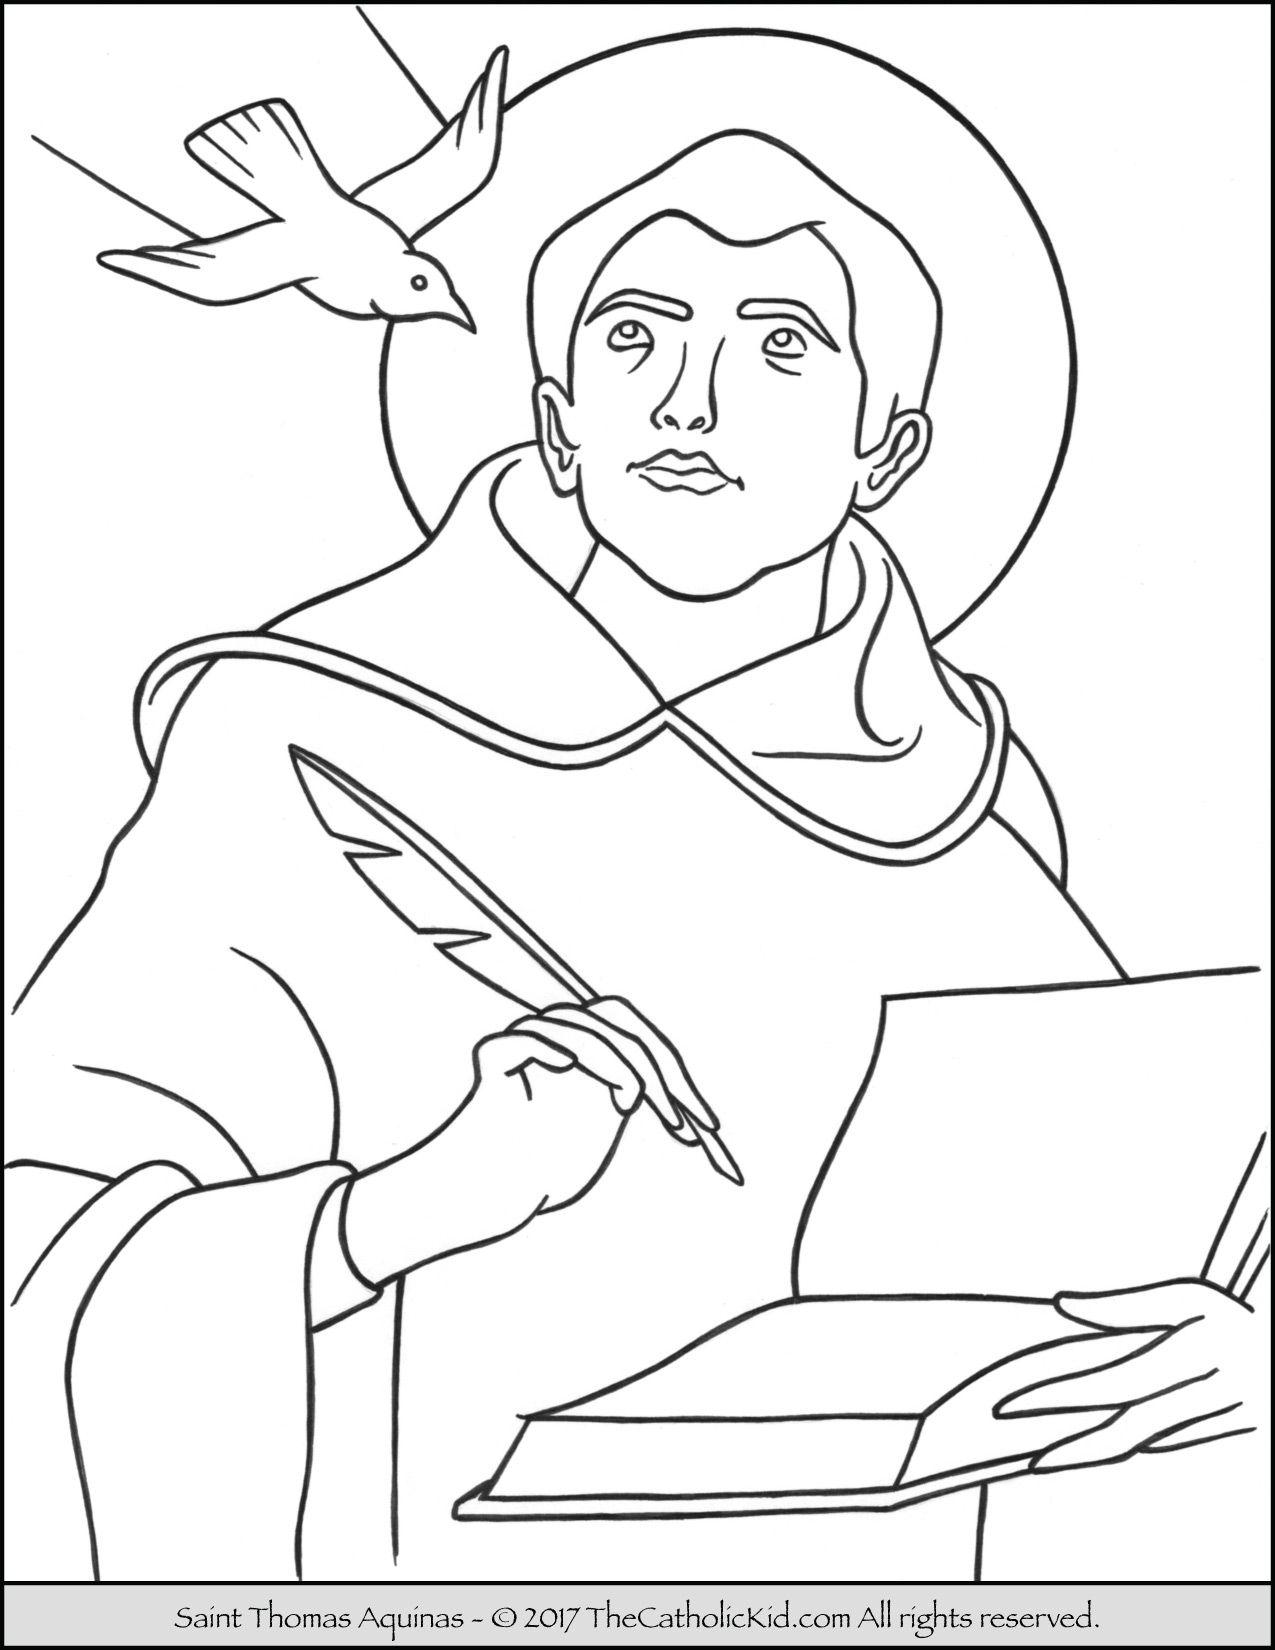 Saint Thomas Aquinas Coloring Page Thecatholickid Com Catholic